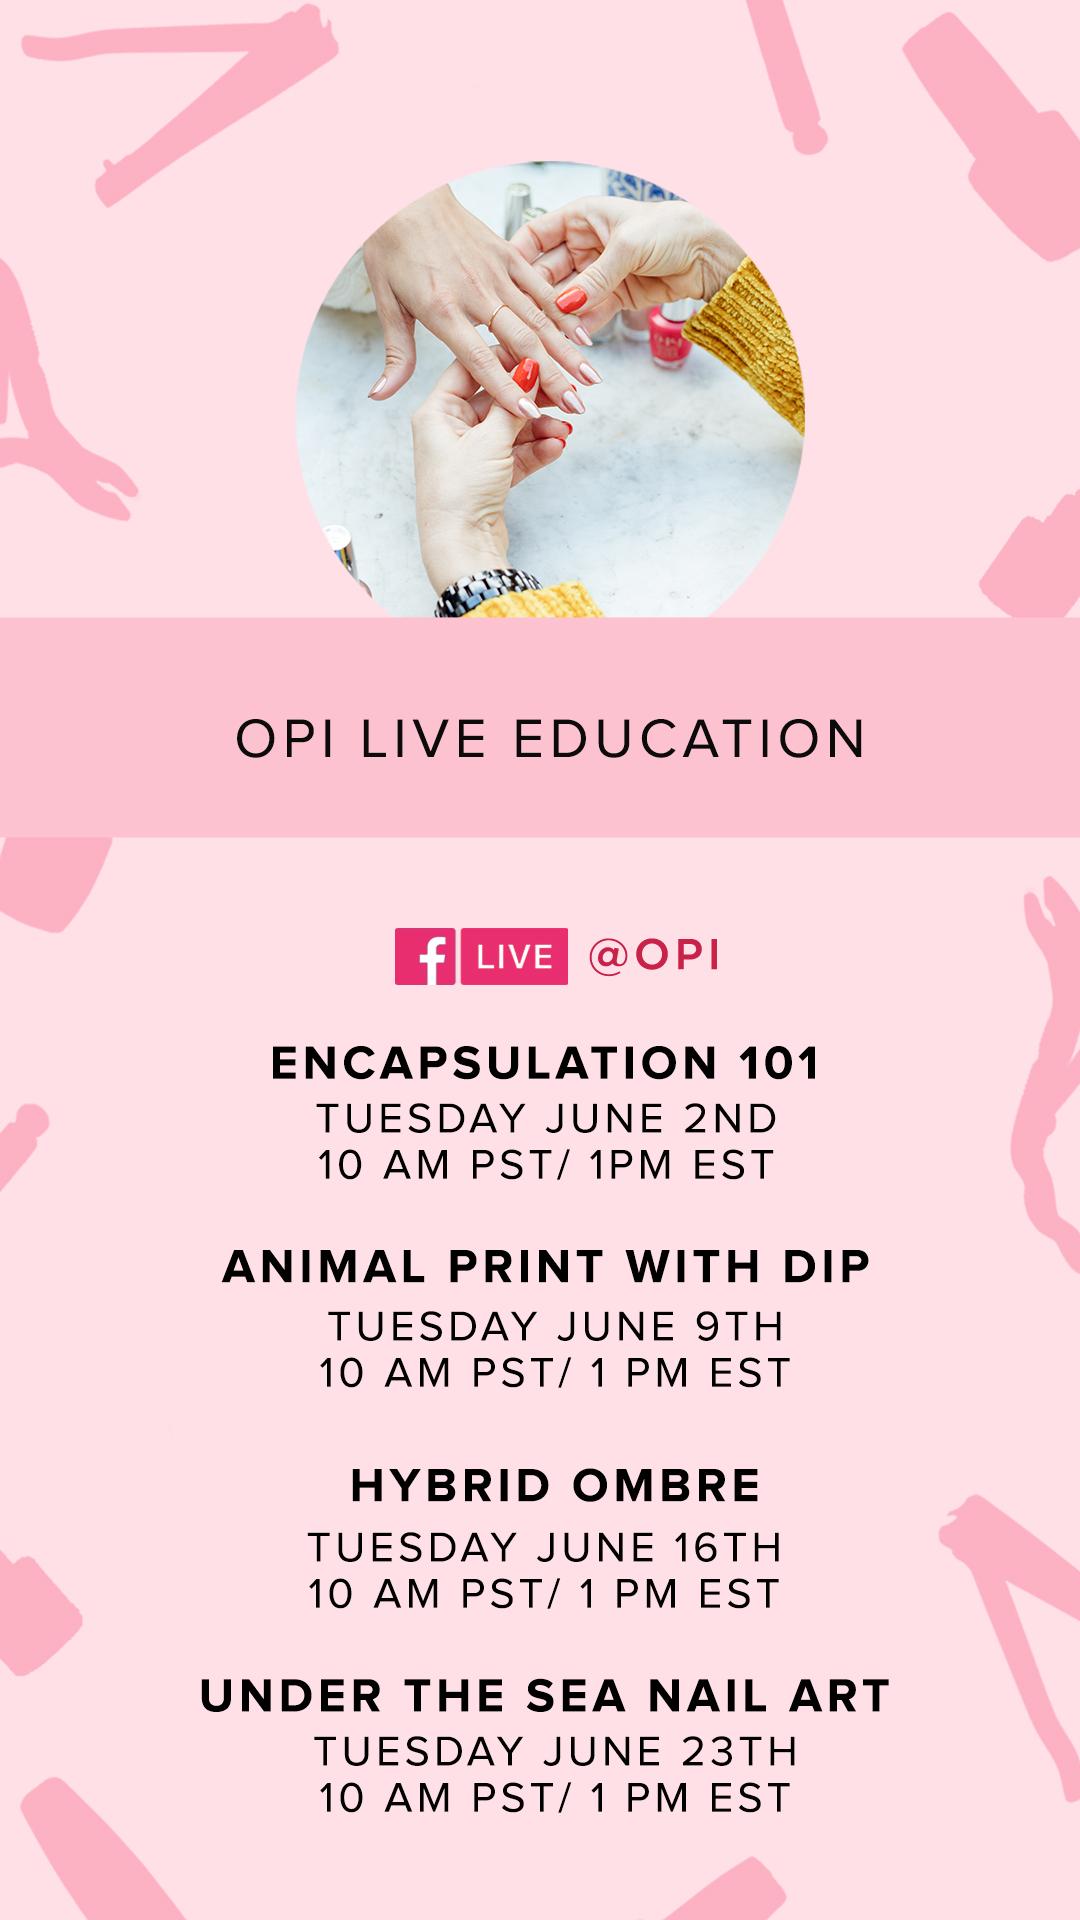 OPI Announces Live Education for June